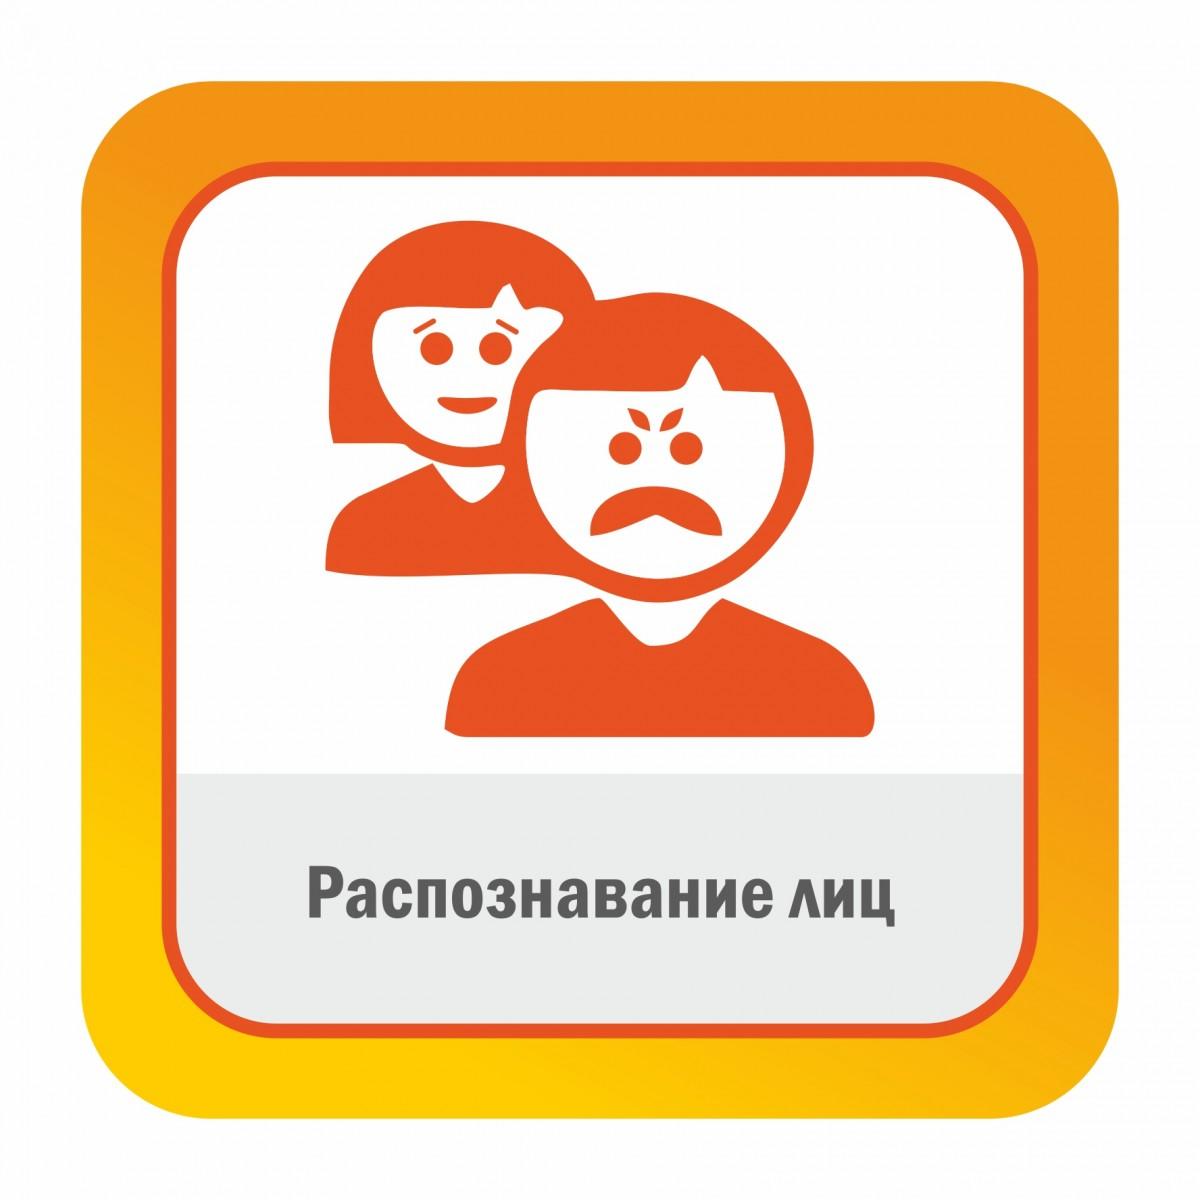 Распознавание лиц Satvision